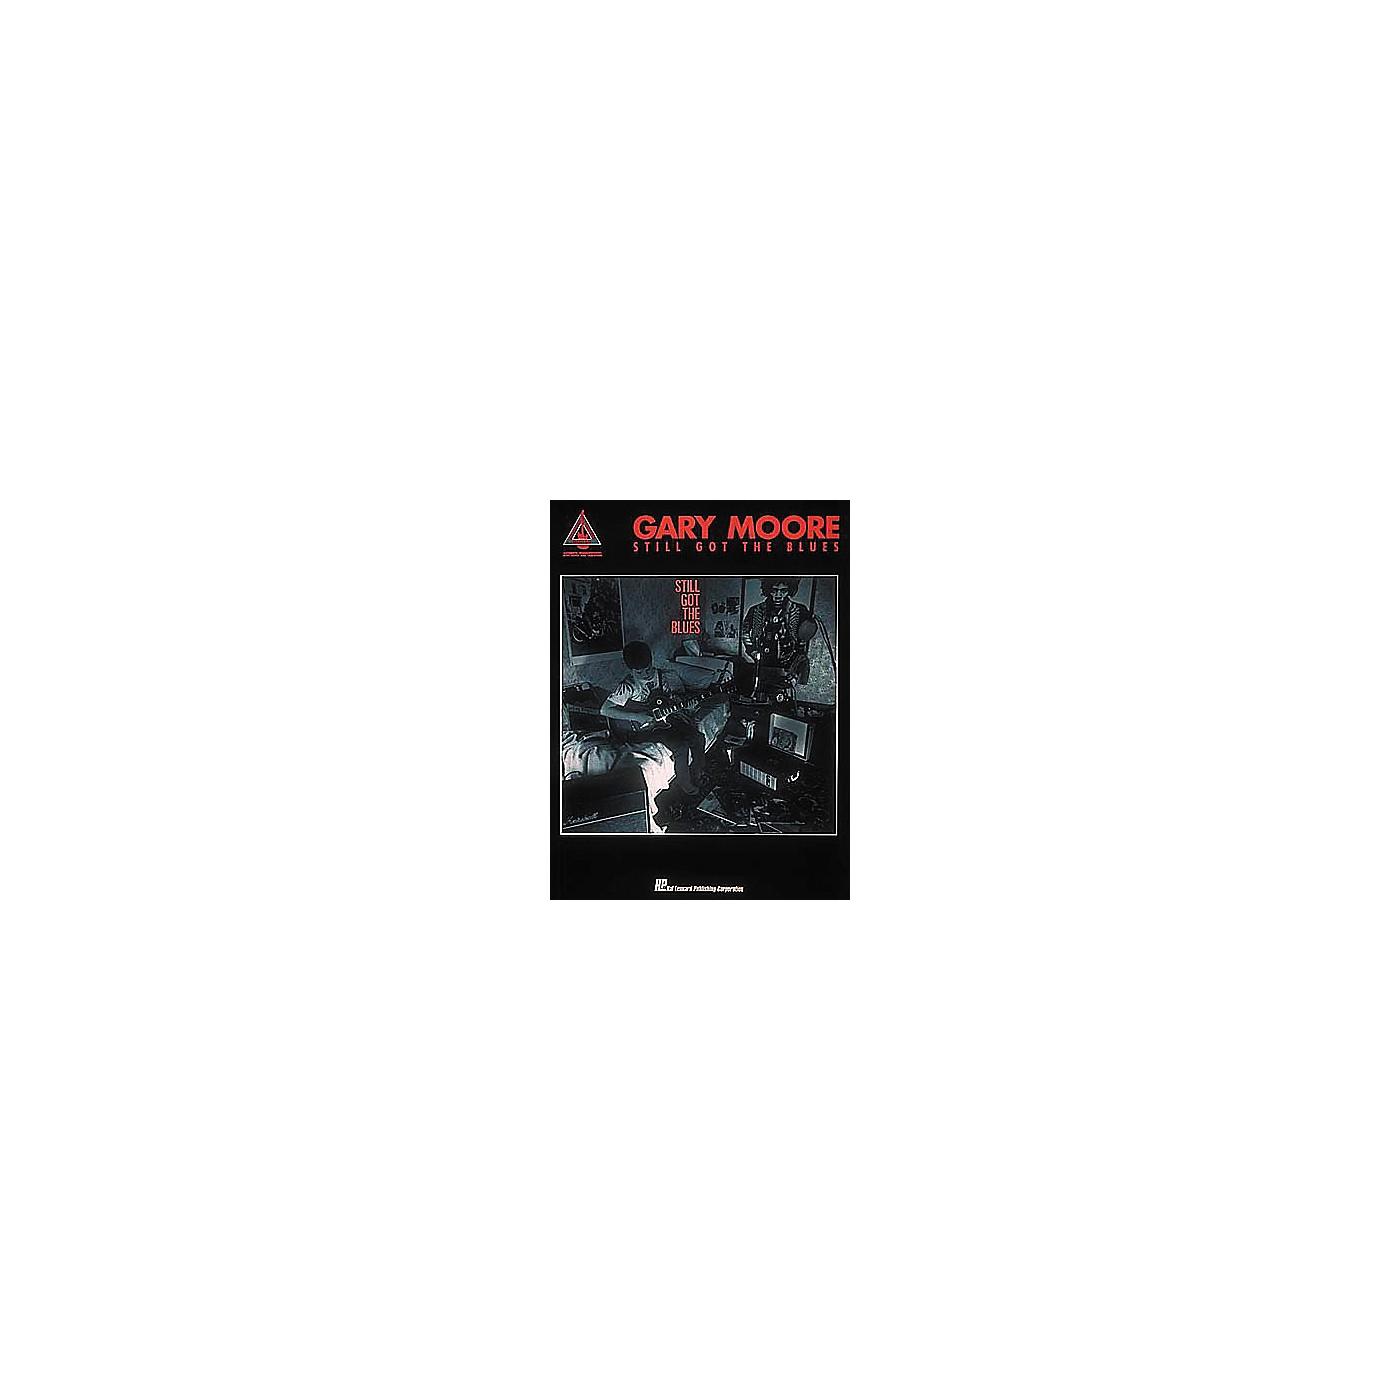 Hal Leonard Gary Moore Still Got The Blues Guitar Tab Songbook thumbnail